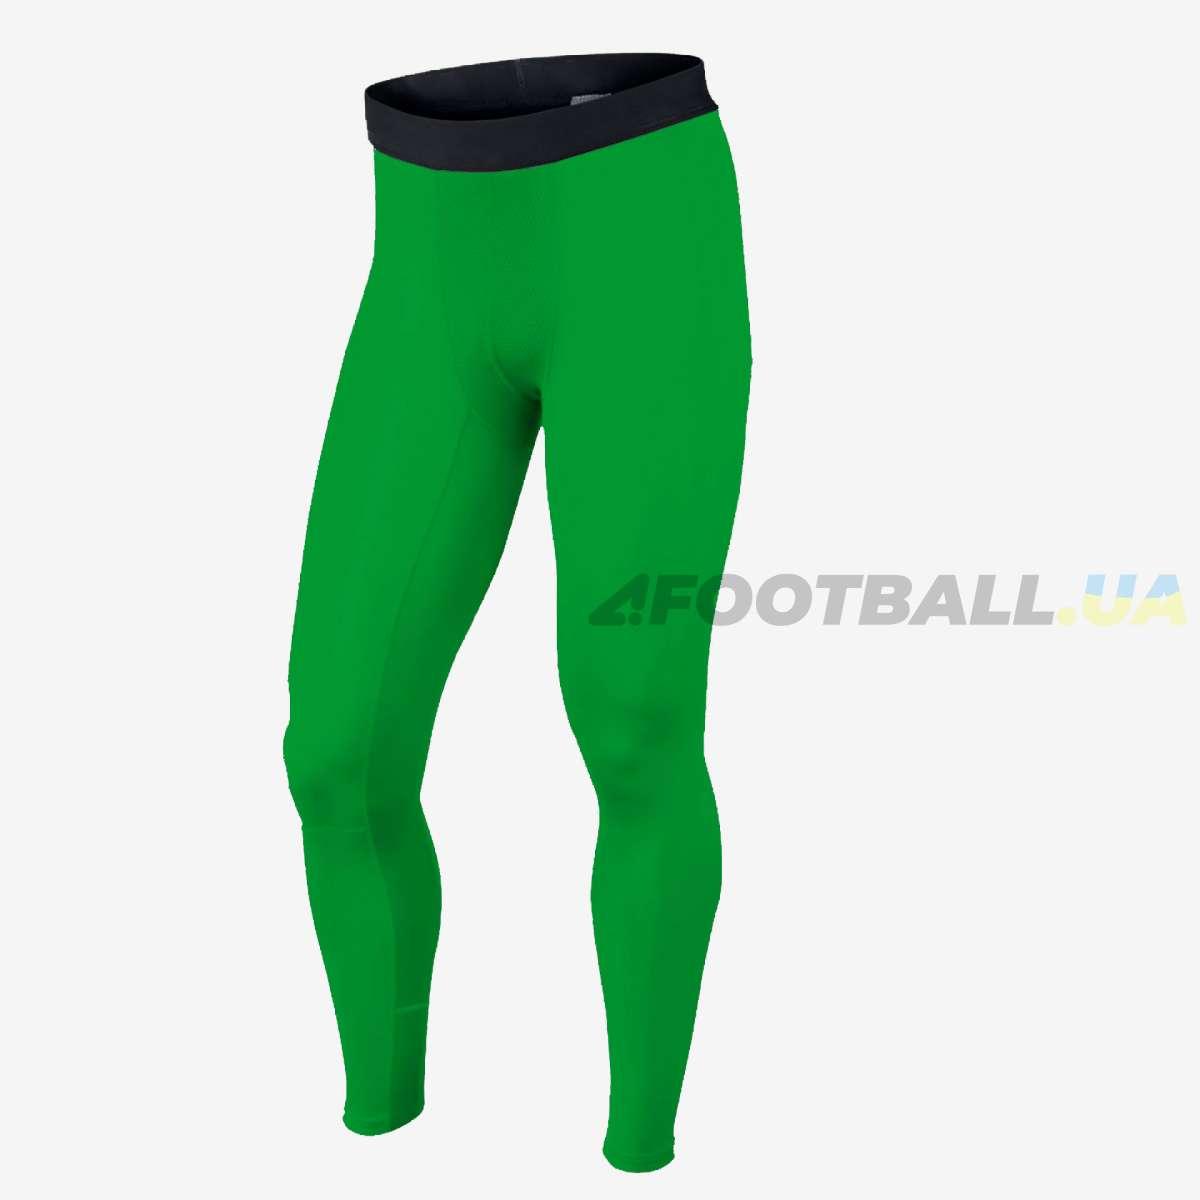 323e212ae10f Компрессионное термобелье штаны Nike HyperWarm 824616-319 — купить в ...